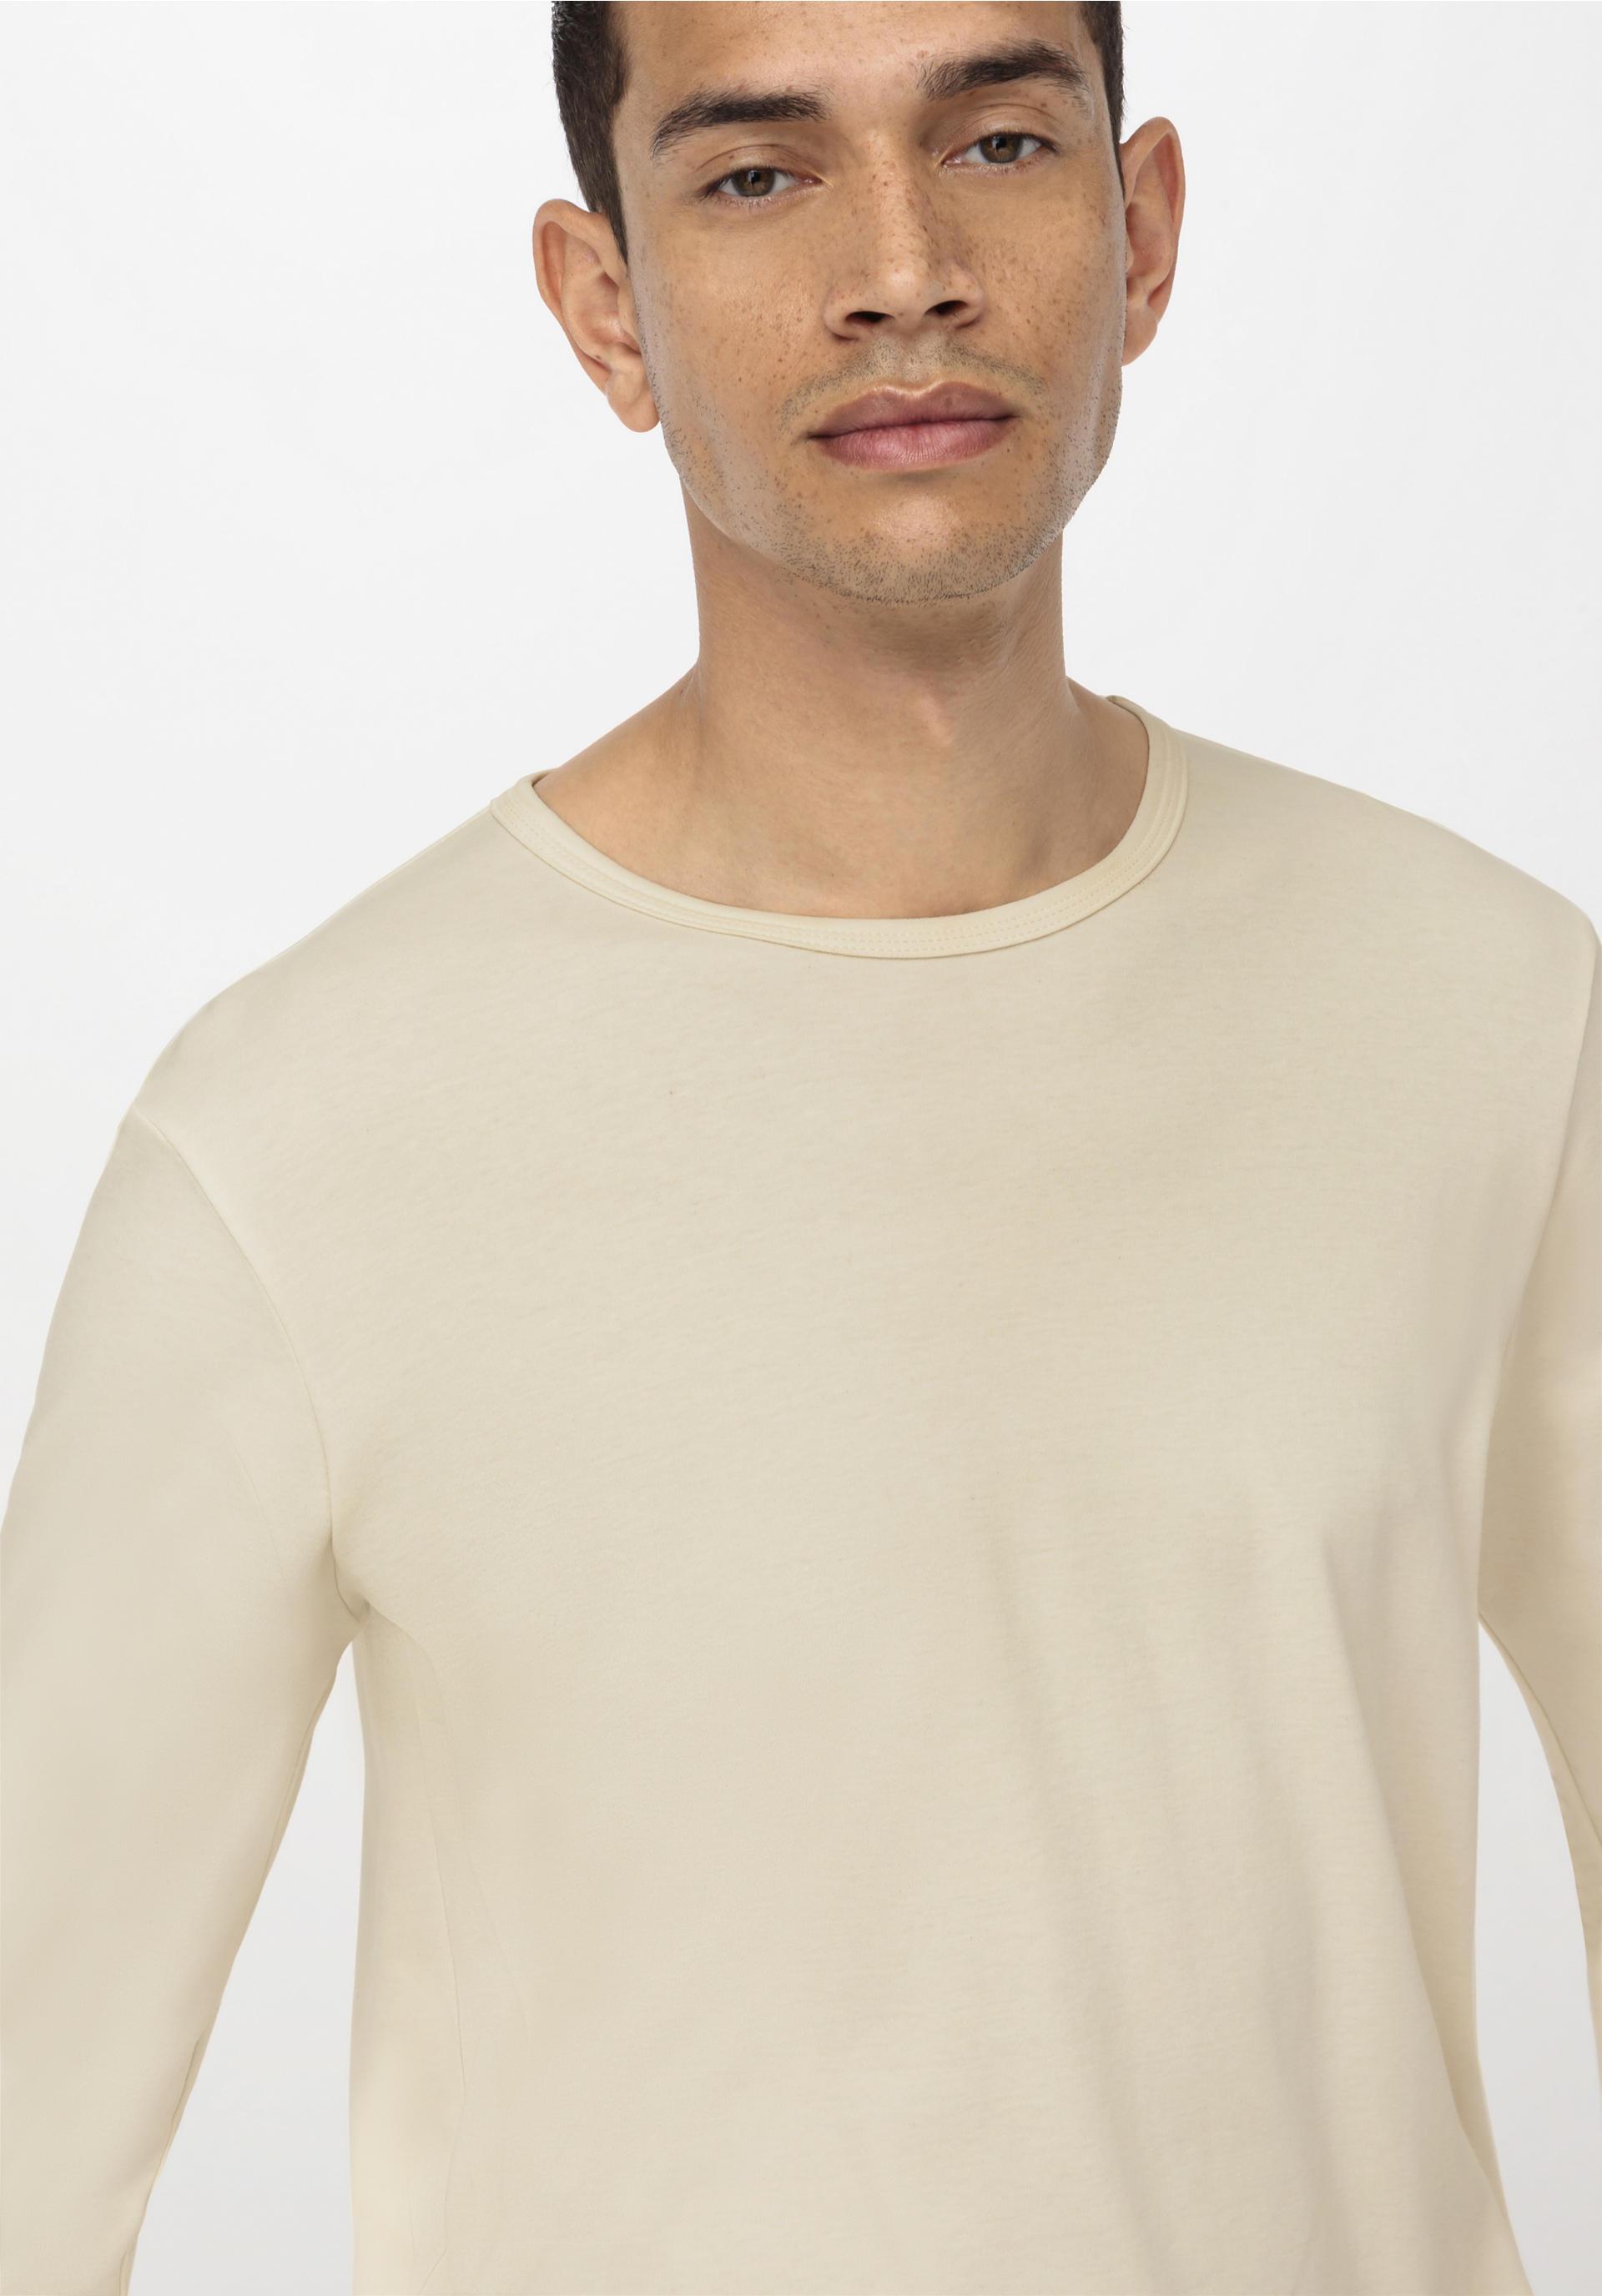 huge selection of fd7b7 33eb4 Herren Pyjama PureNATURE aus reiner Bio-Baumwolle von hessnatur